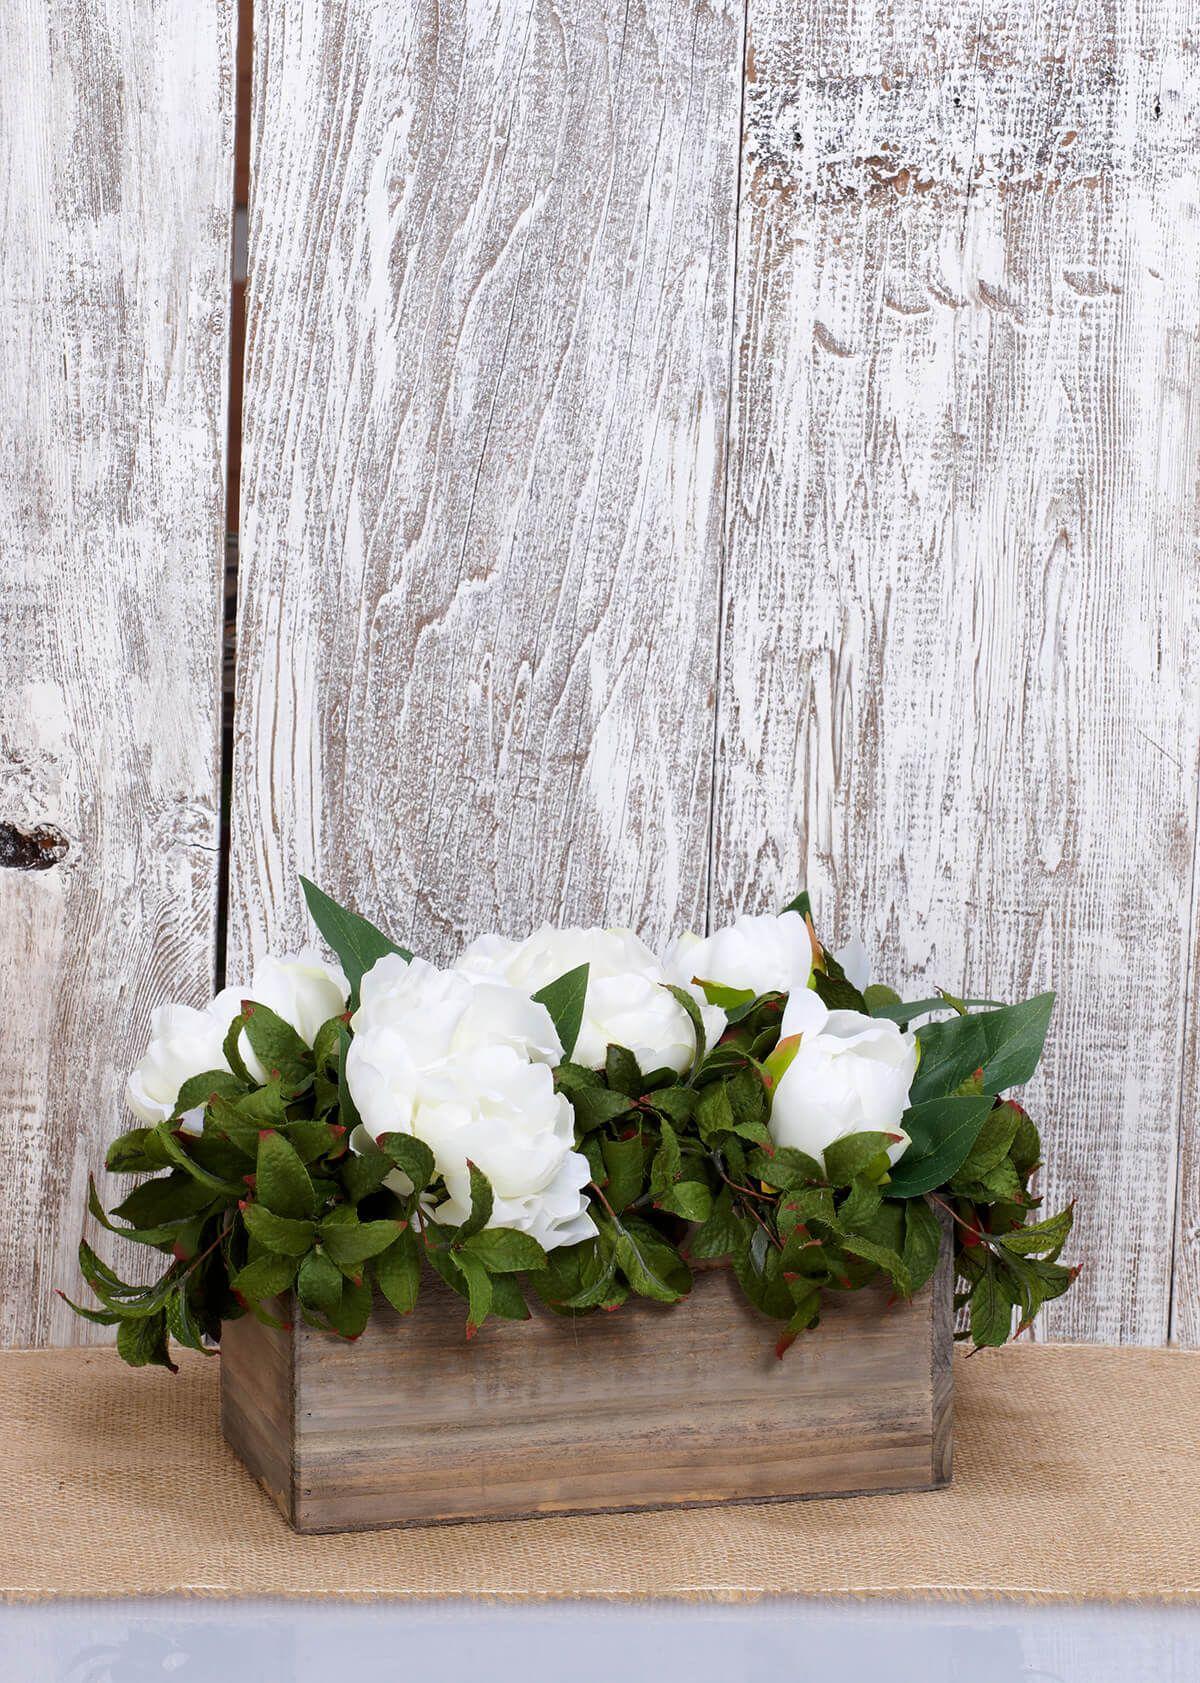 Planter Box Wood 10x5 Rustic Wedding Decor Wood Planters Rustic Wedding Decor Diy